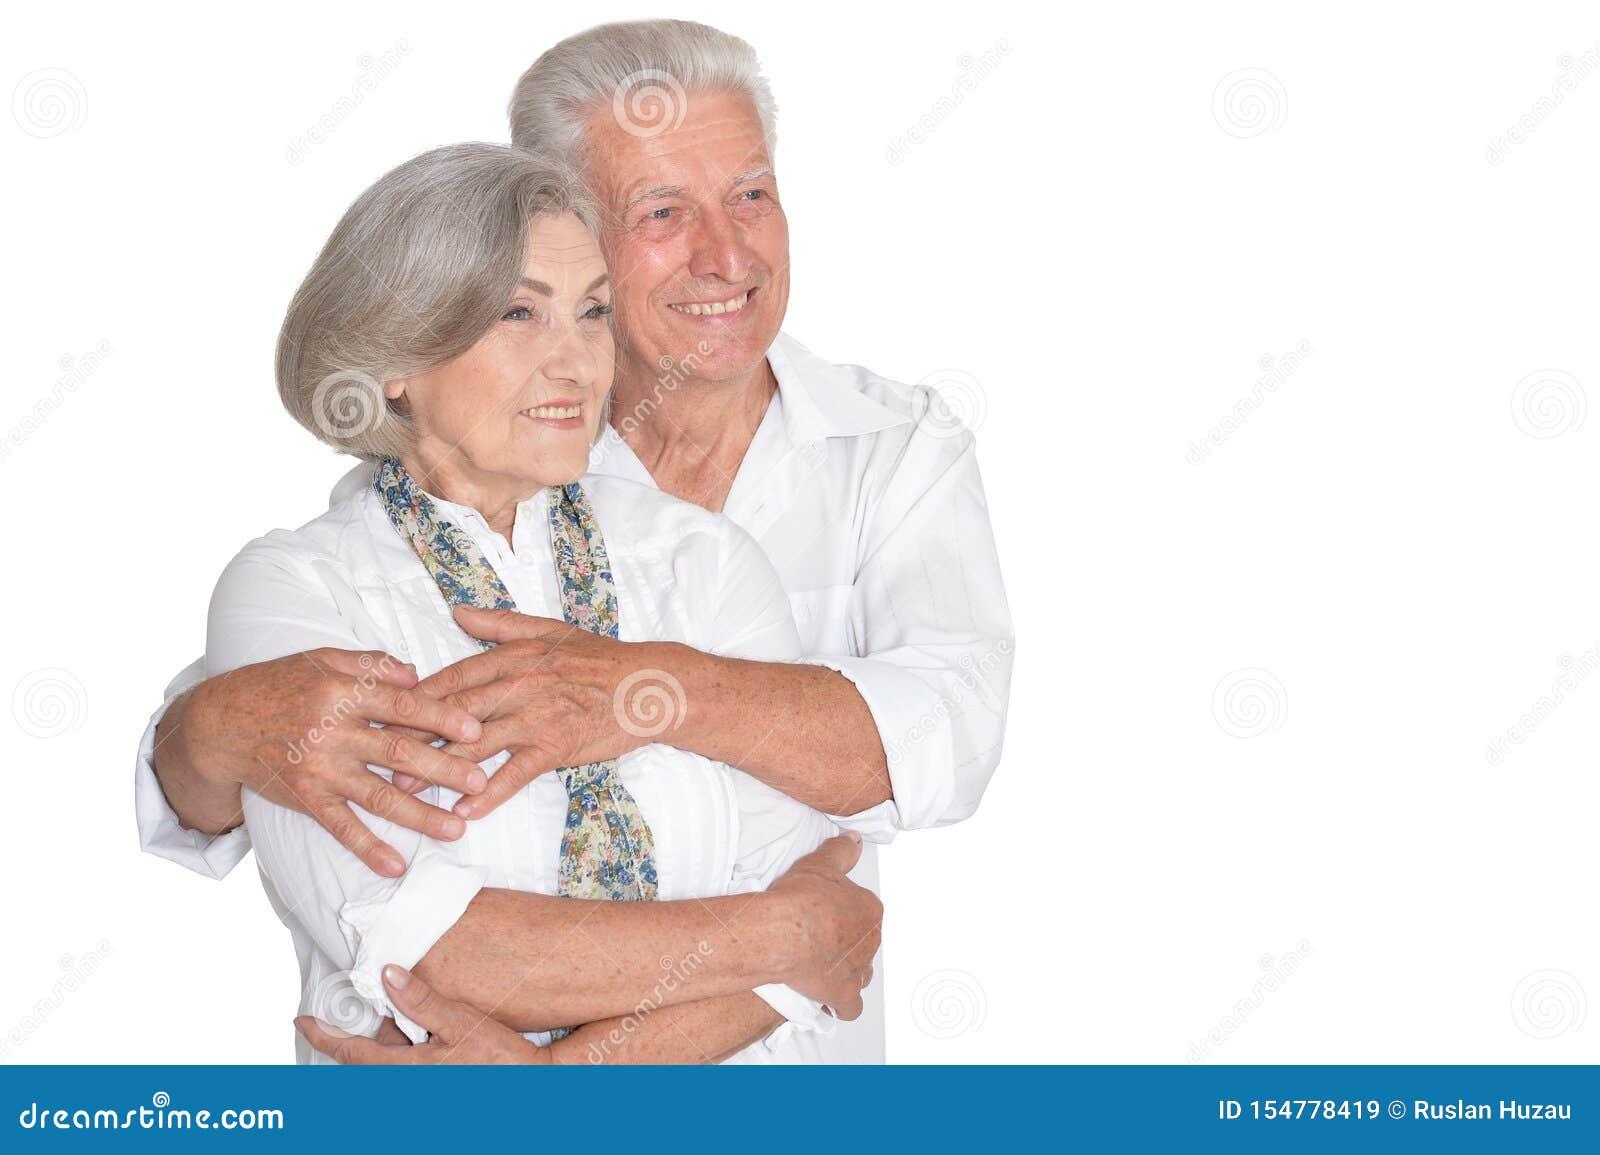 Happy beautiful senior couple huging and posing on white background